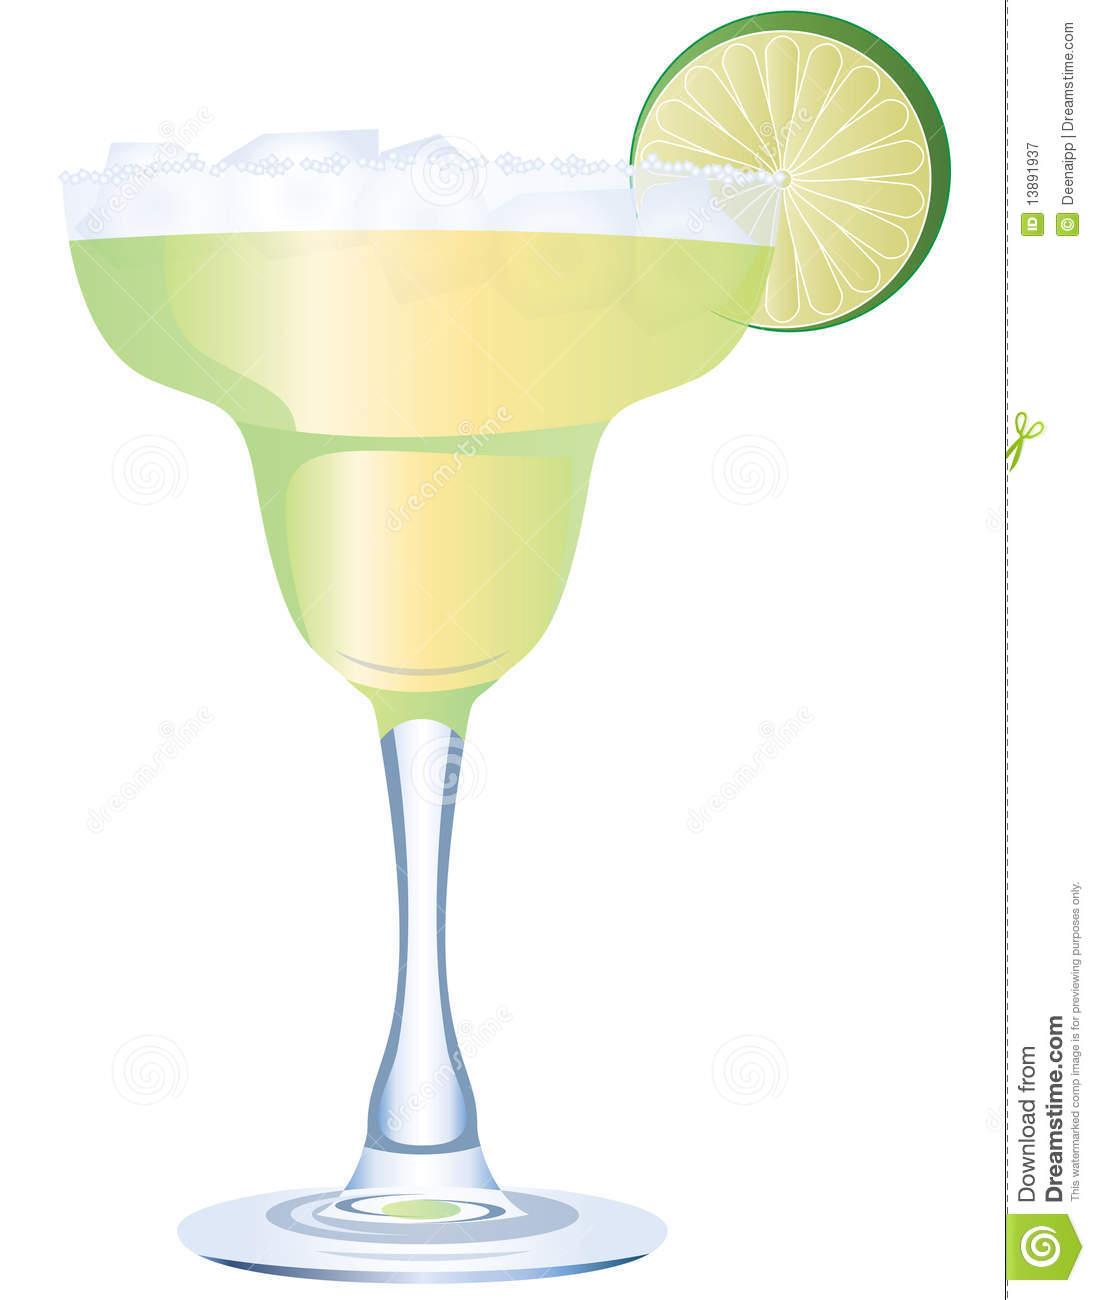 Drink clipart margarita Clipart Margarita Savoronmorehead Savoronmorehead Clipart